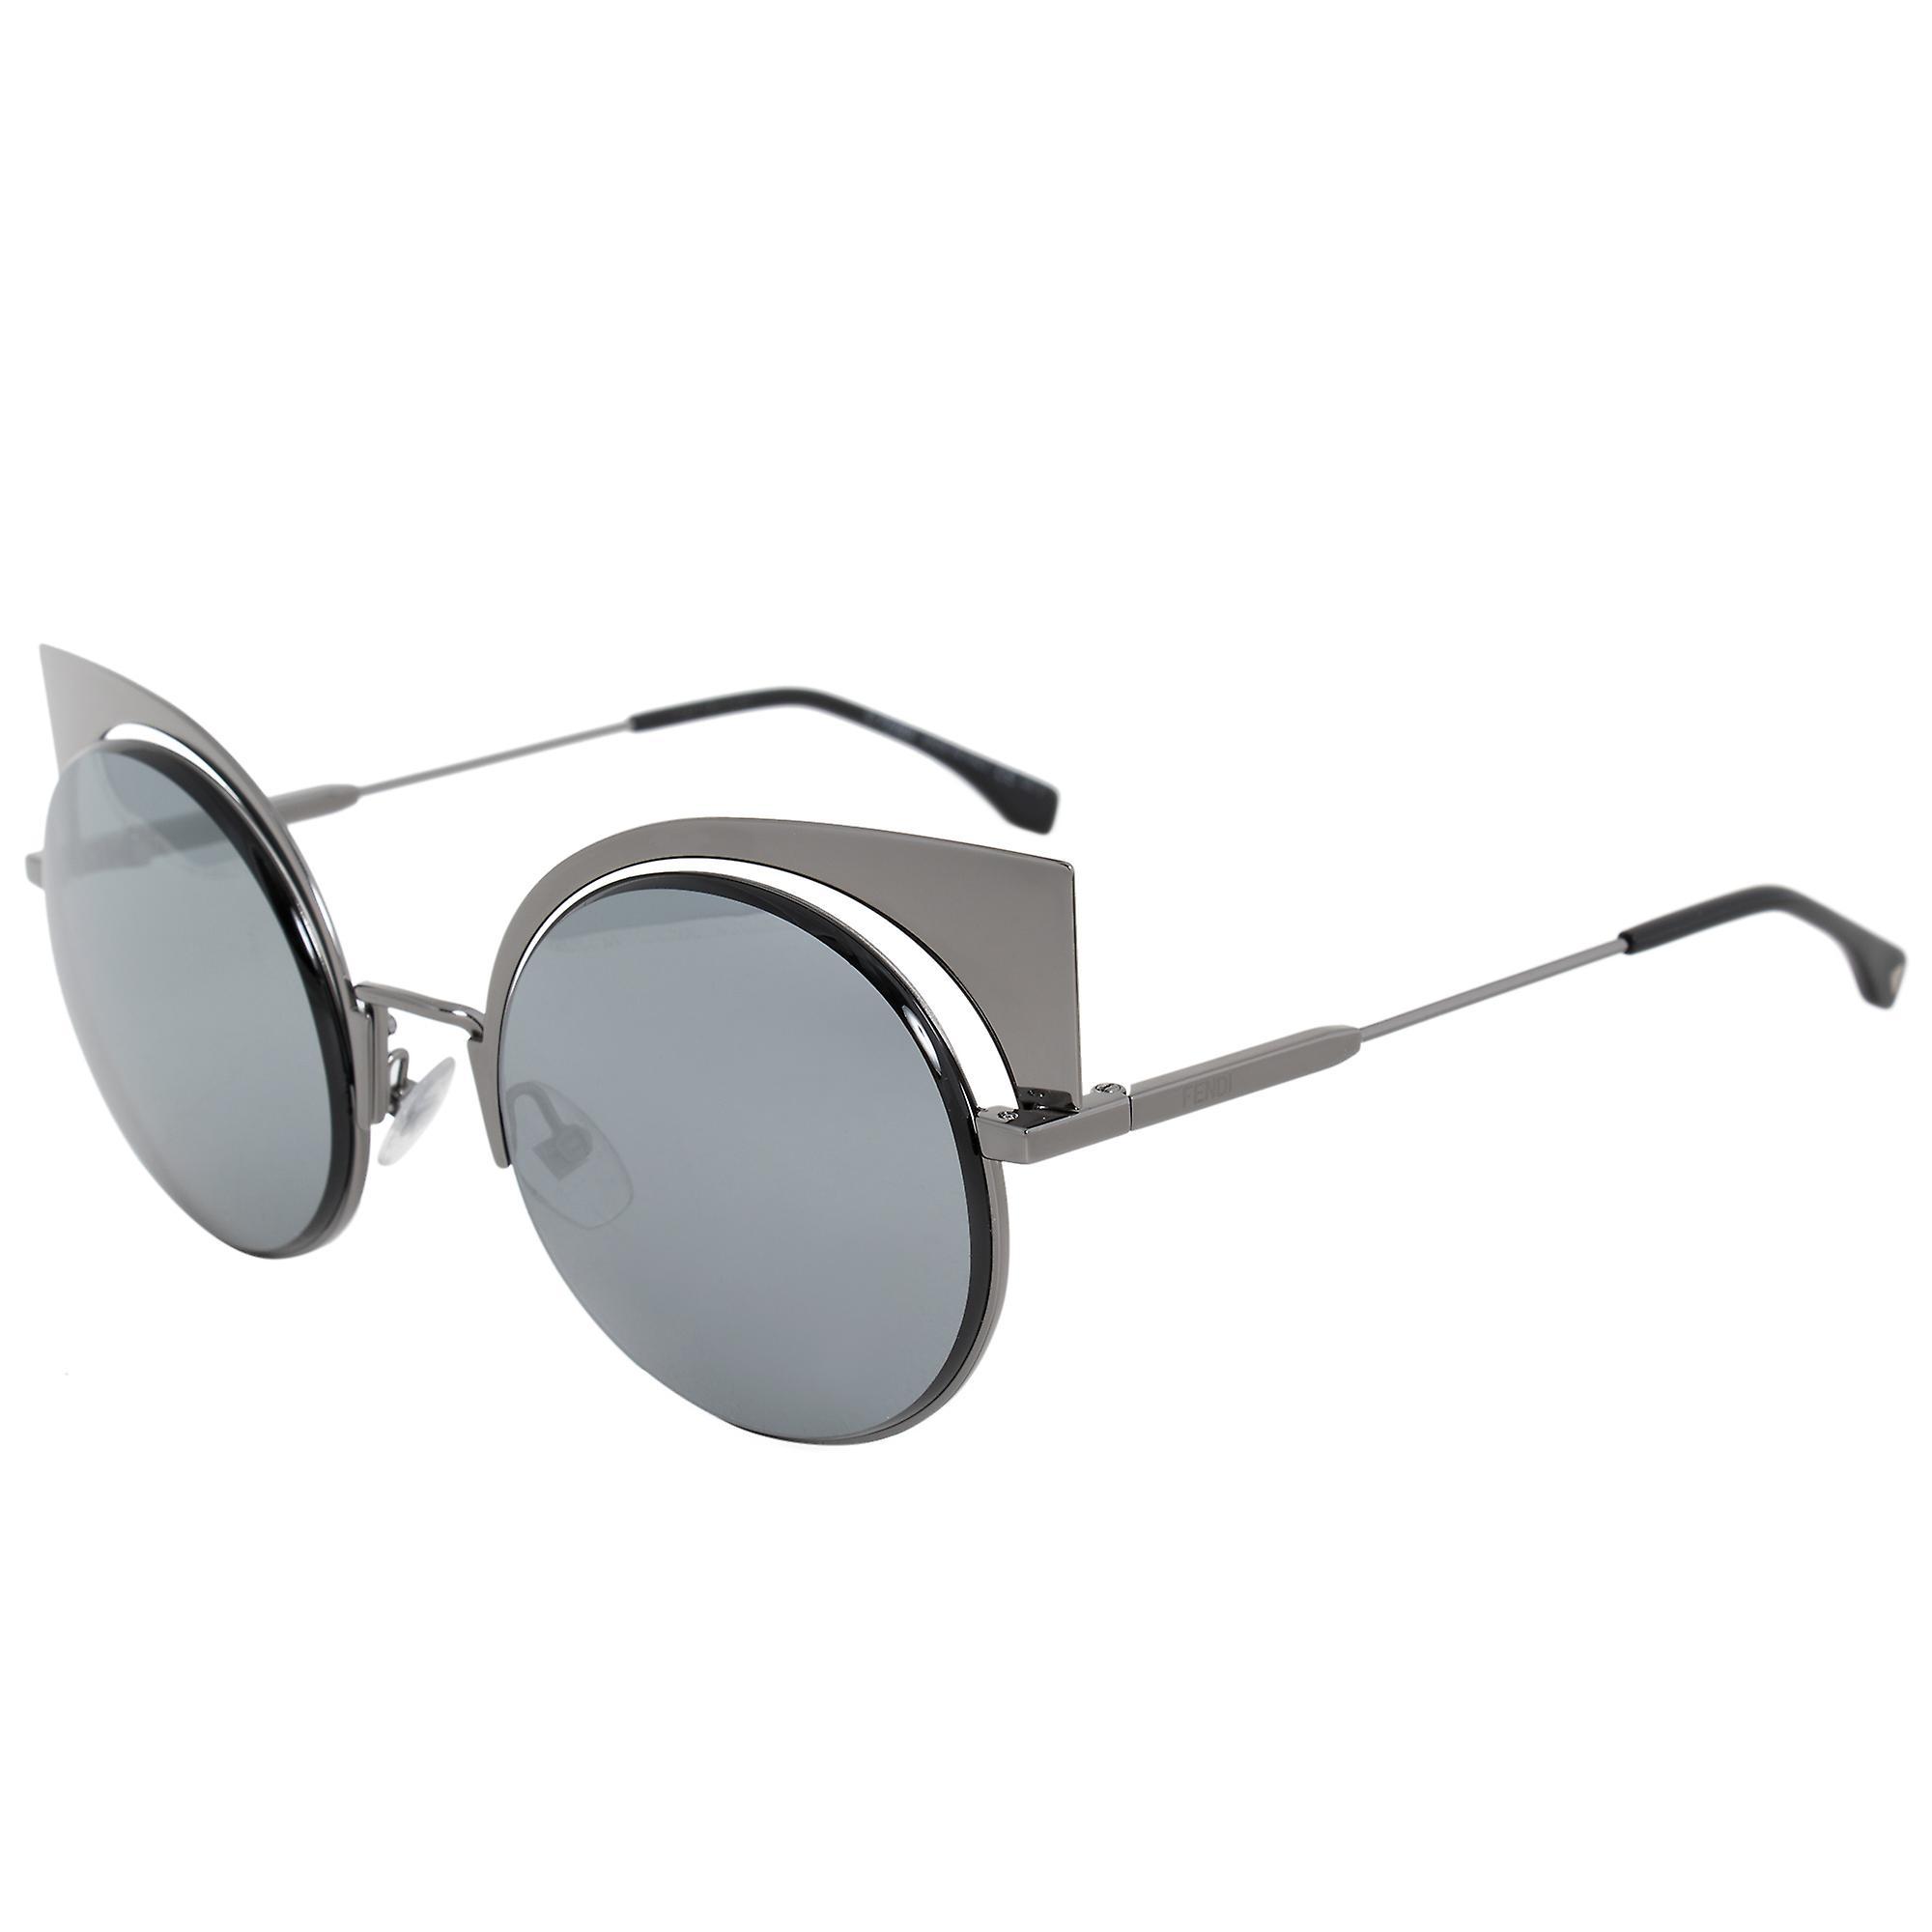 Fendi Eyeshine Cat Eye Sunglasses FF0177S KJ1 T4 53